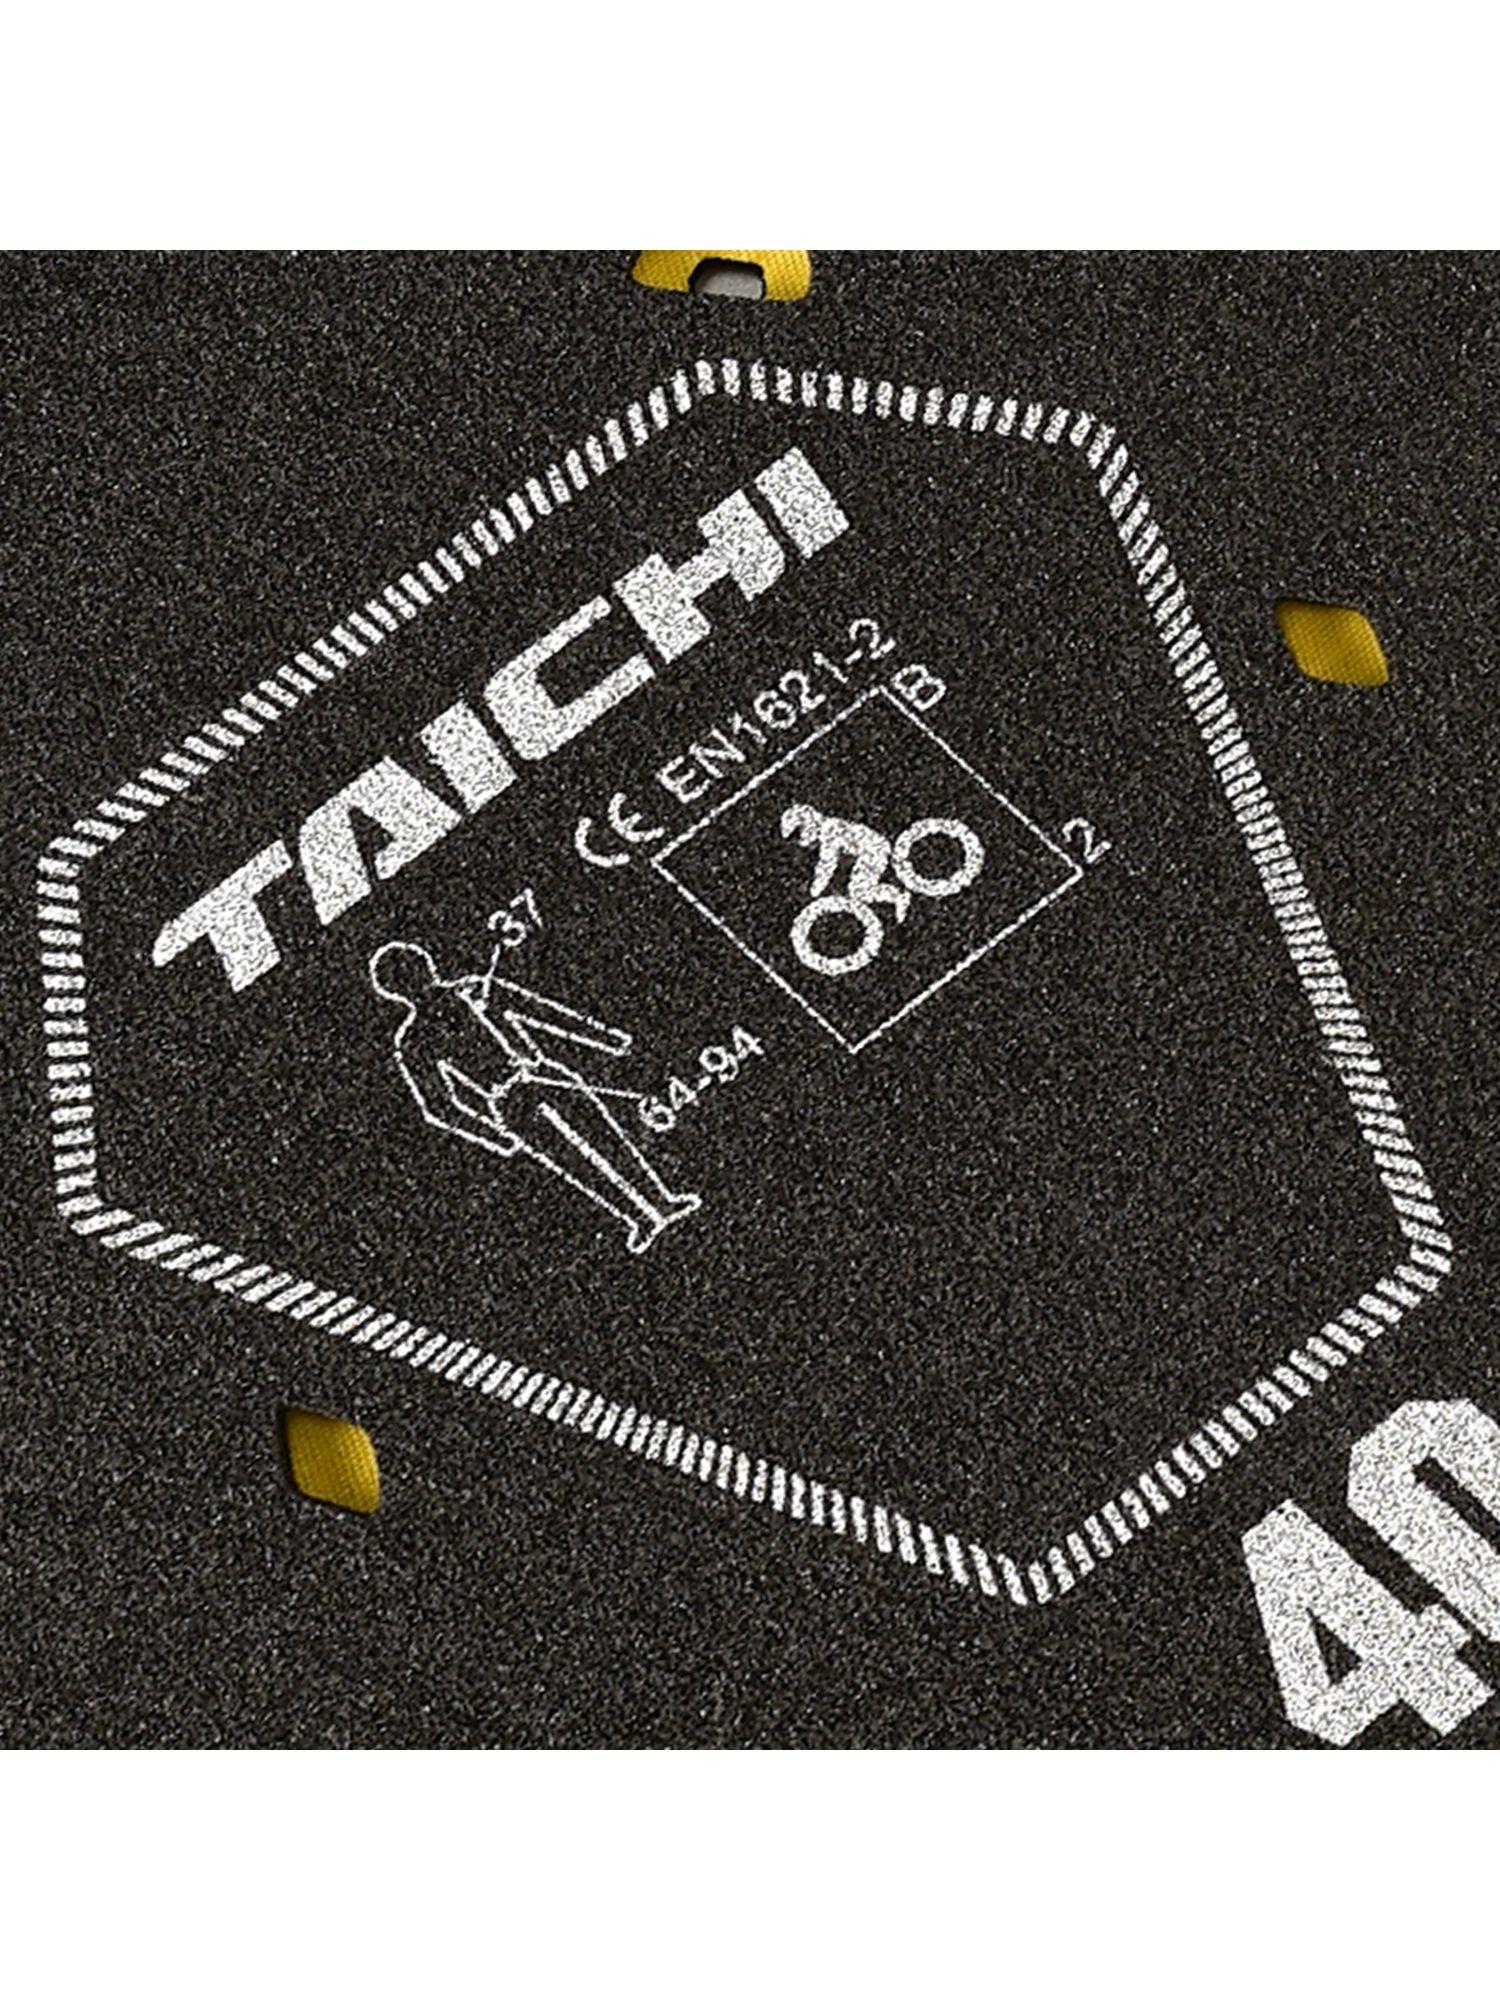 TRV044 | TAICHI CE(LV2)バックプロテクター[1color]